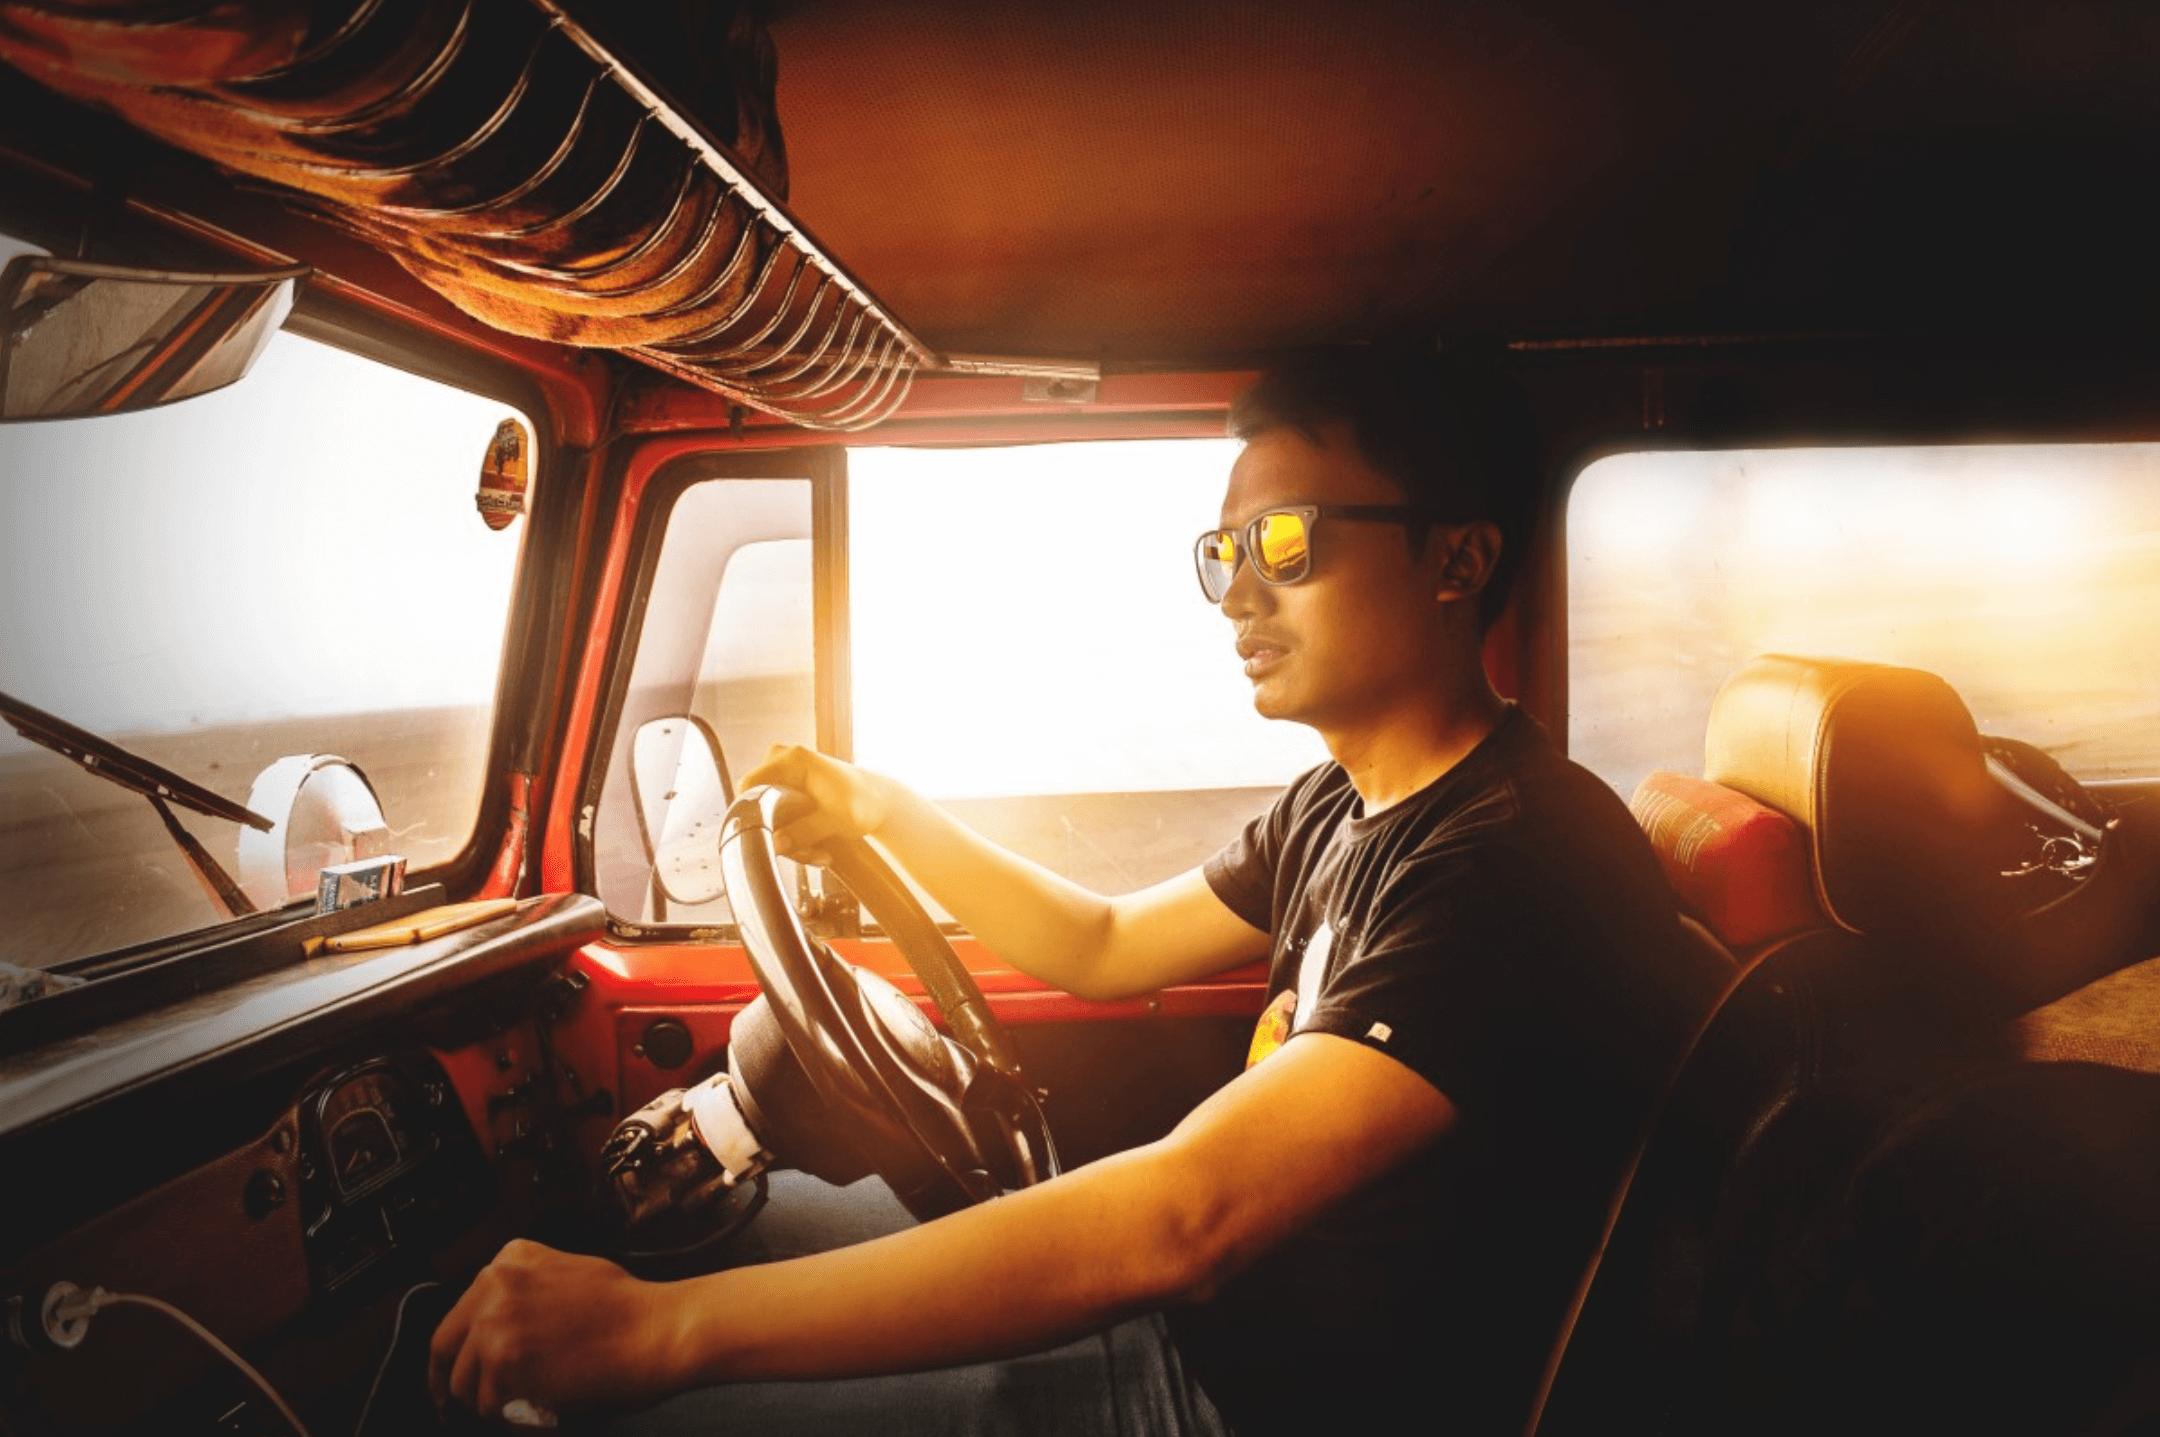 Man driving an old van